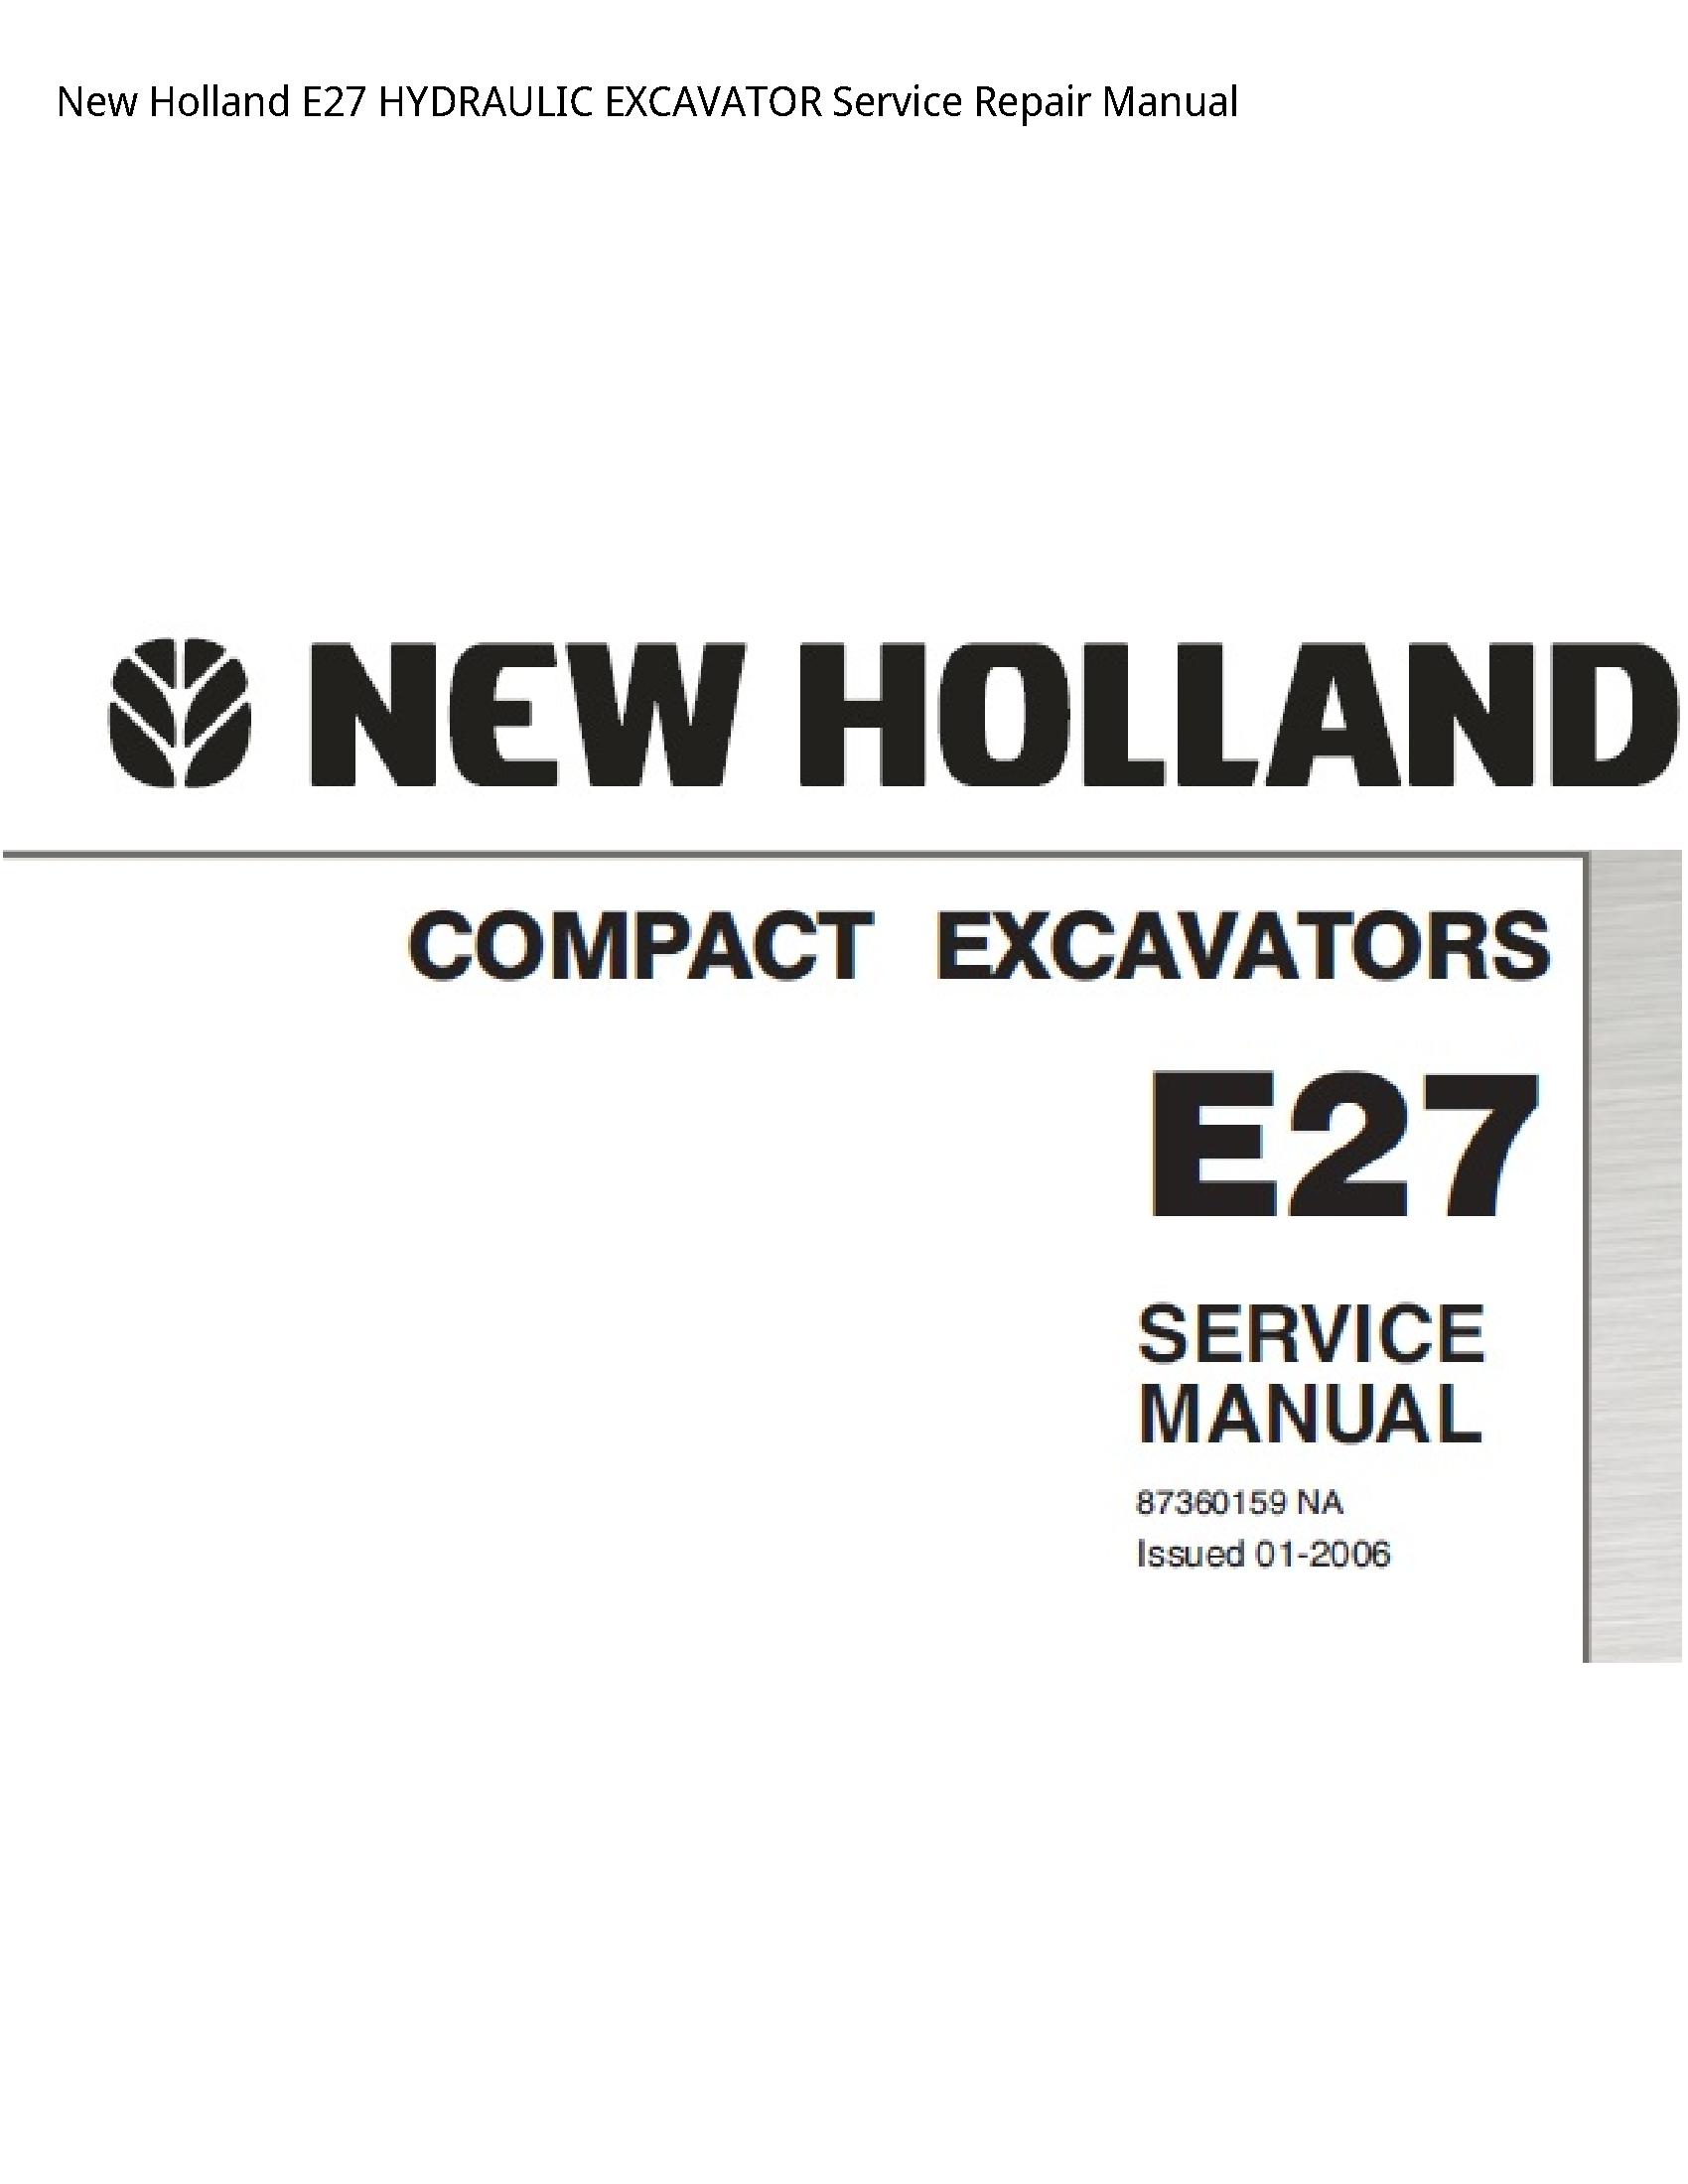 New Holland E27 HYDRAULIC EXCAVATOR manual